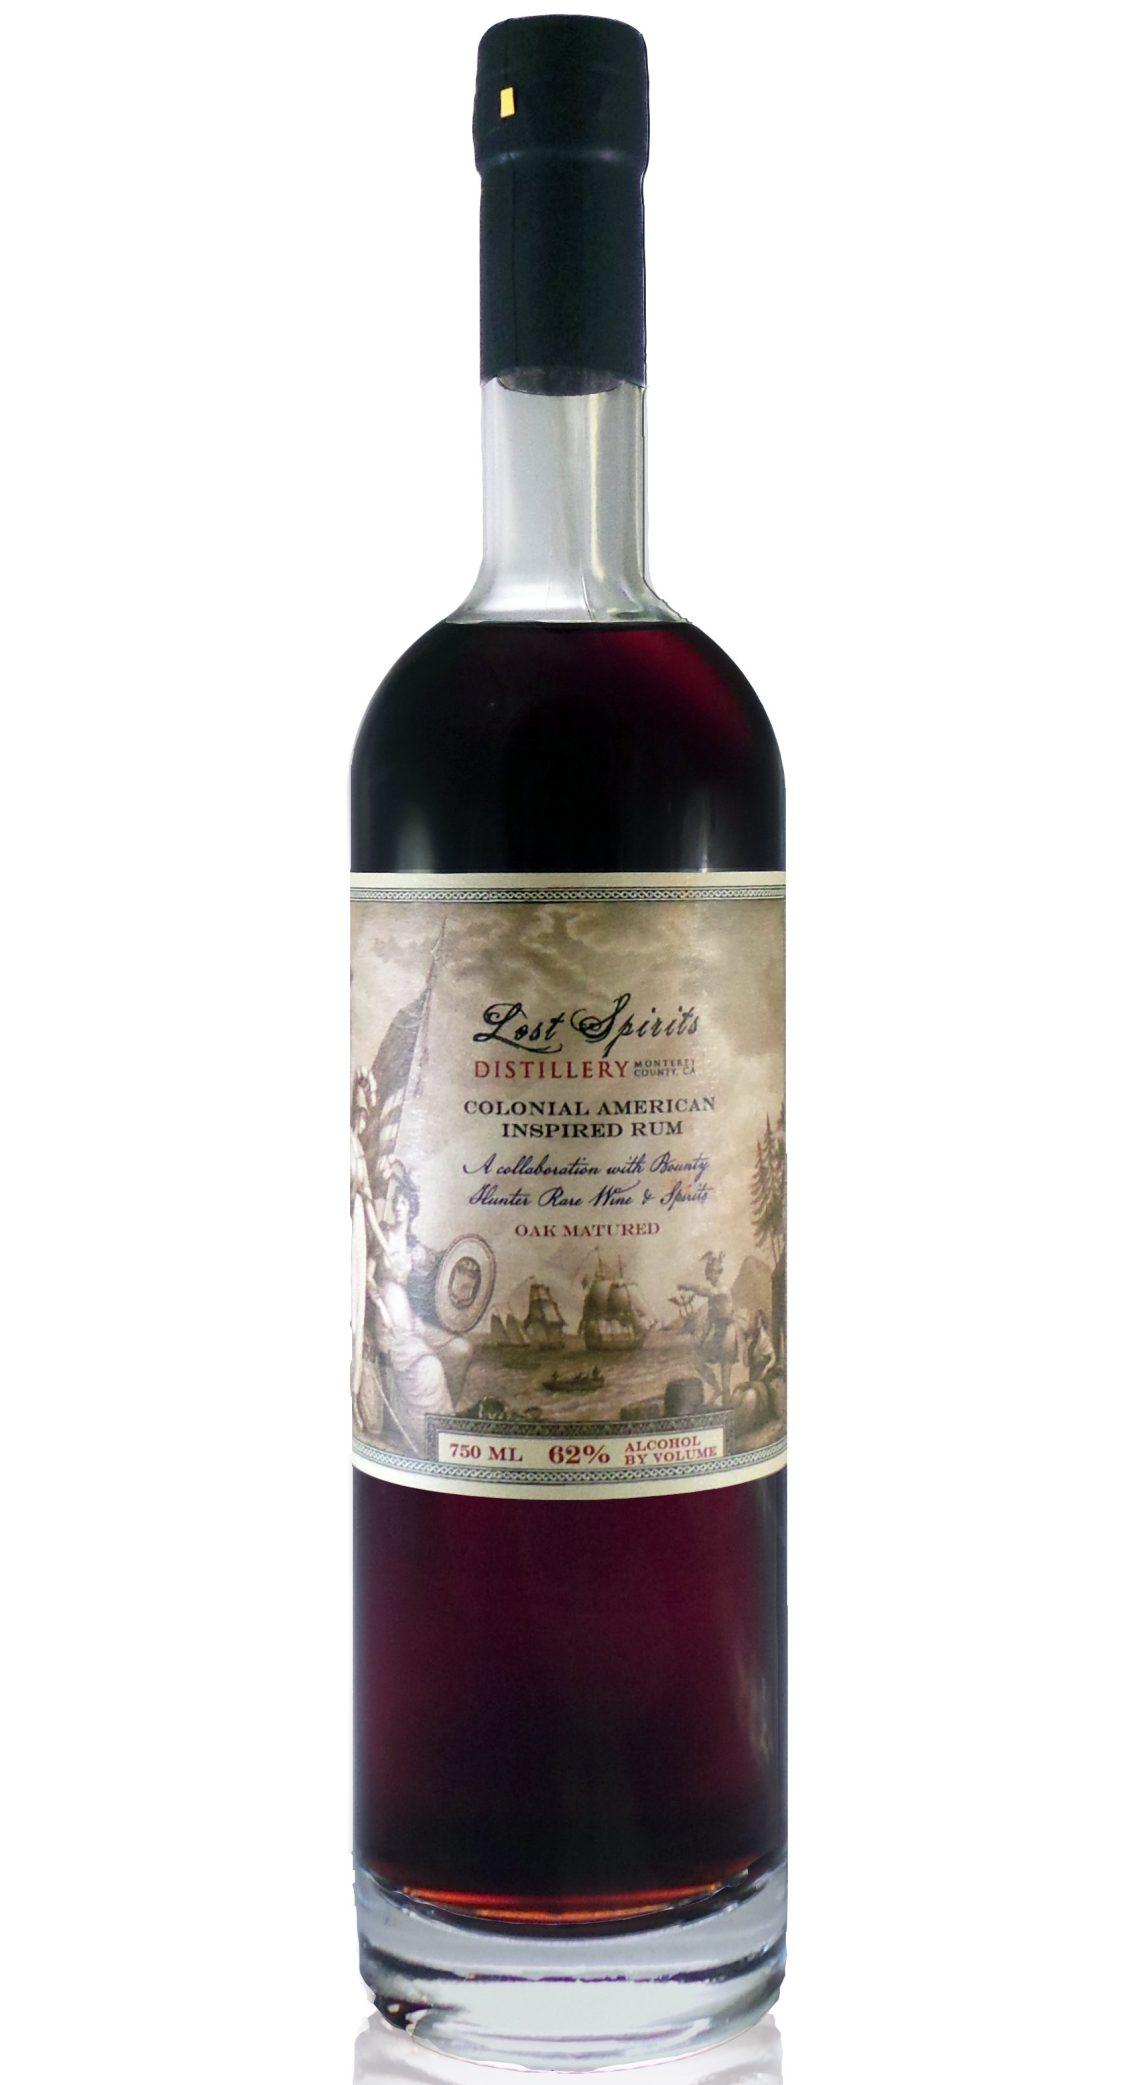 Lost Spirits Colonial American Inspired Rum